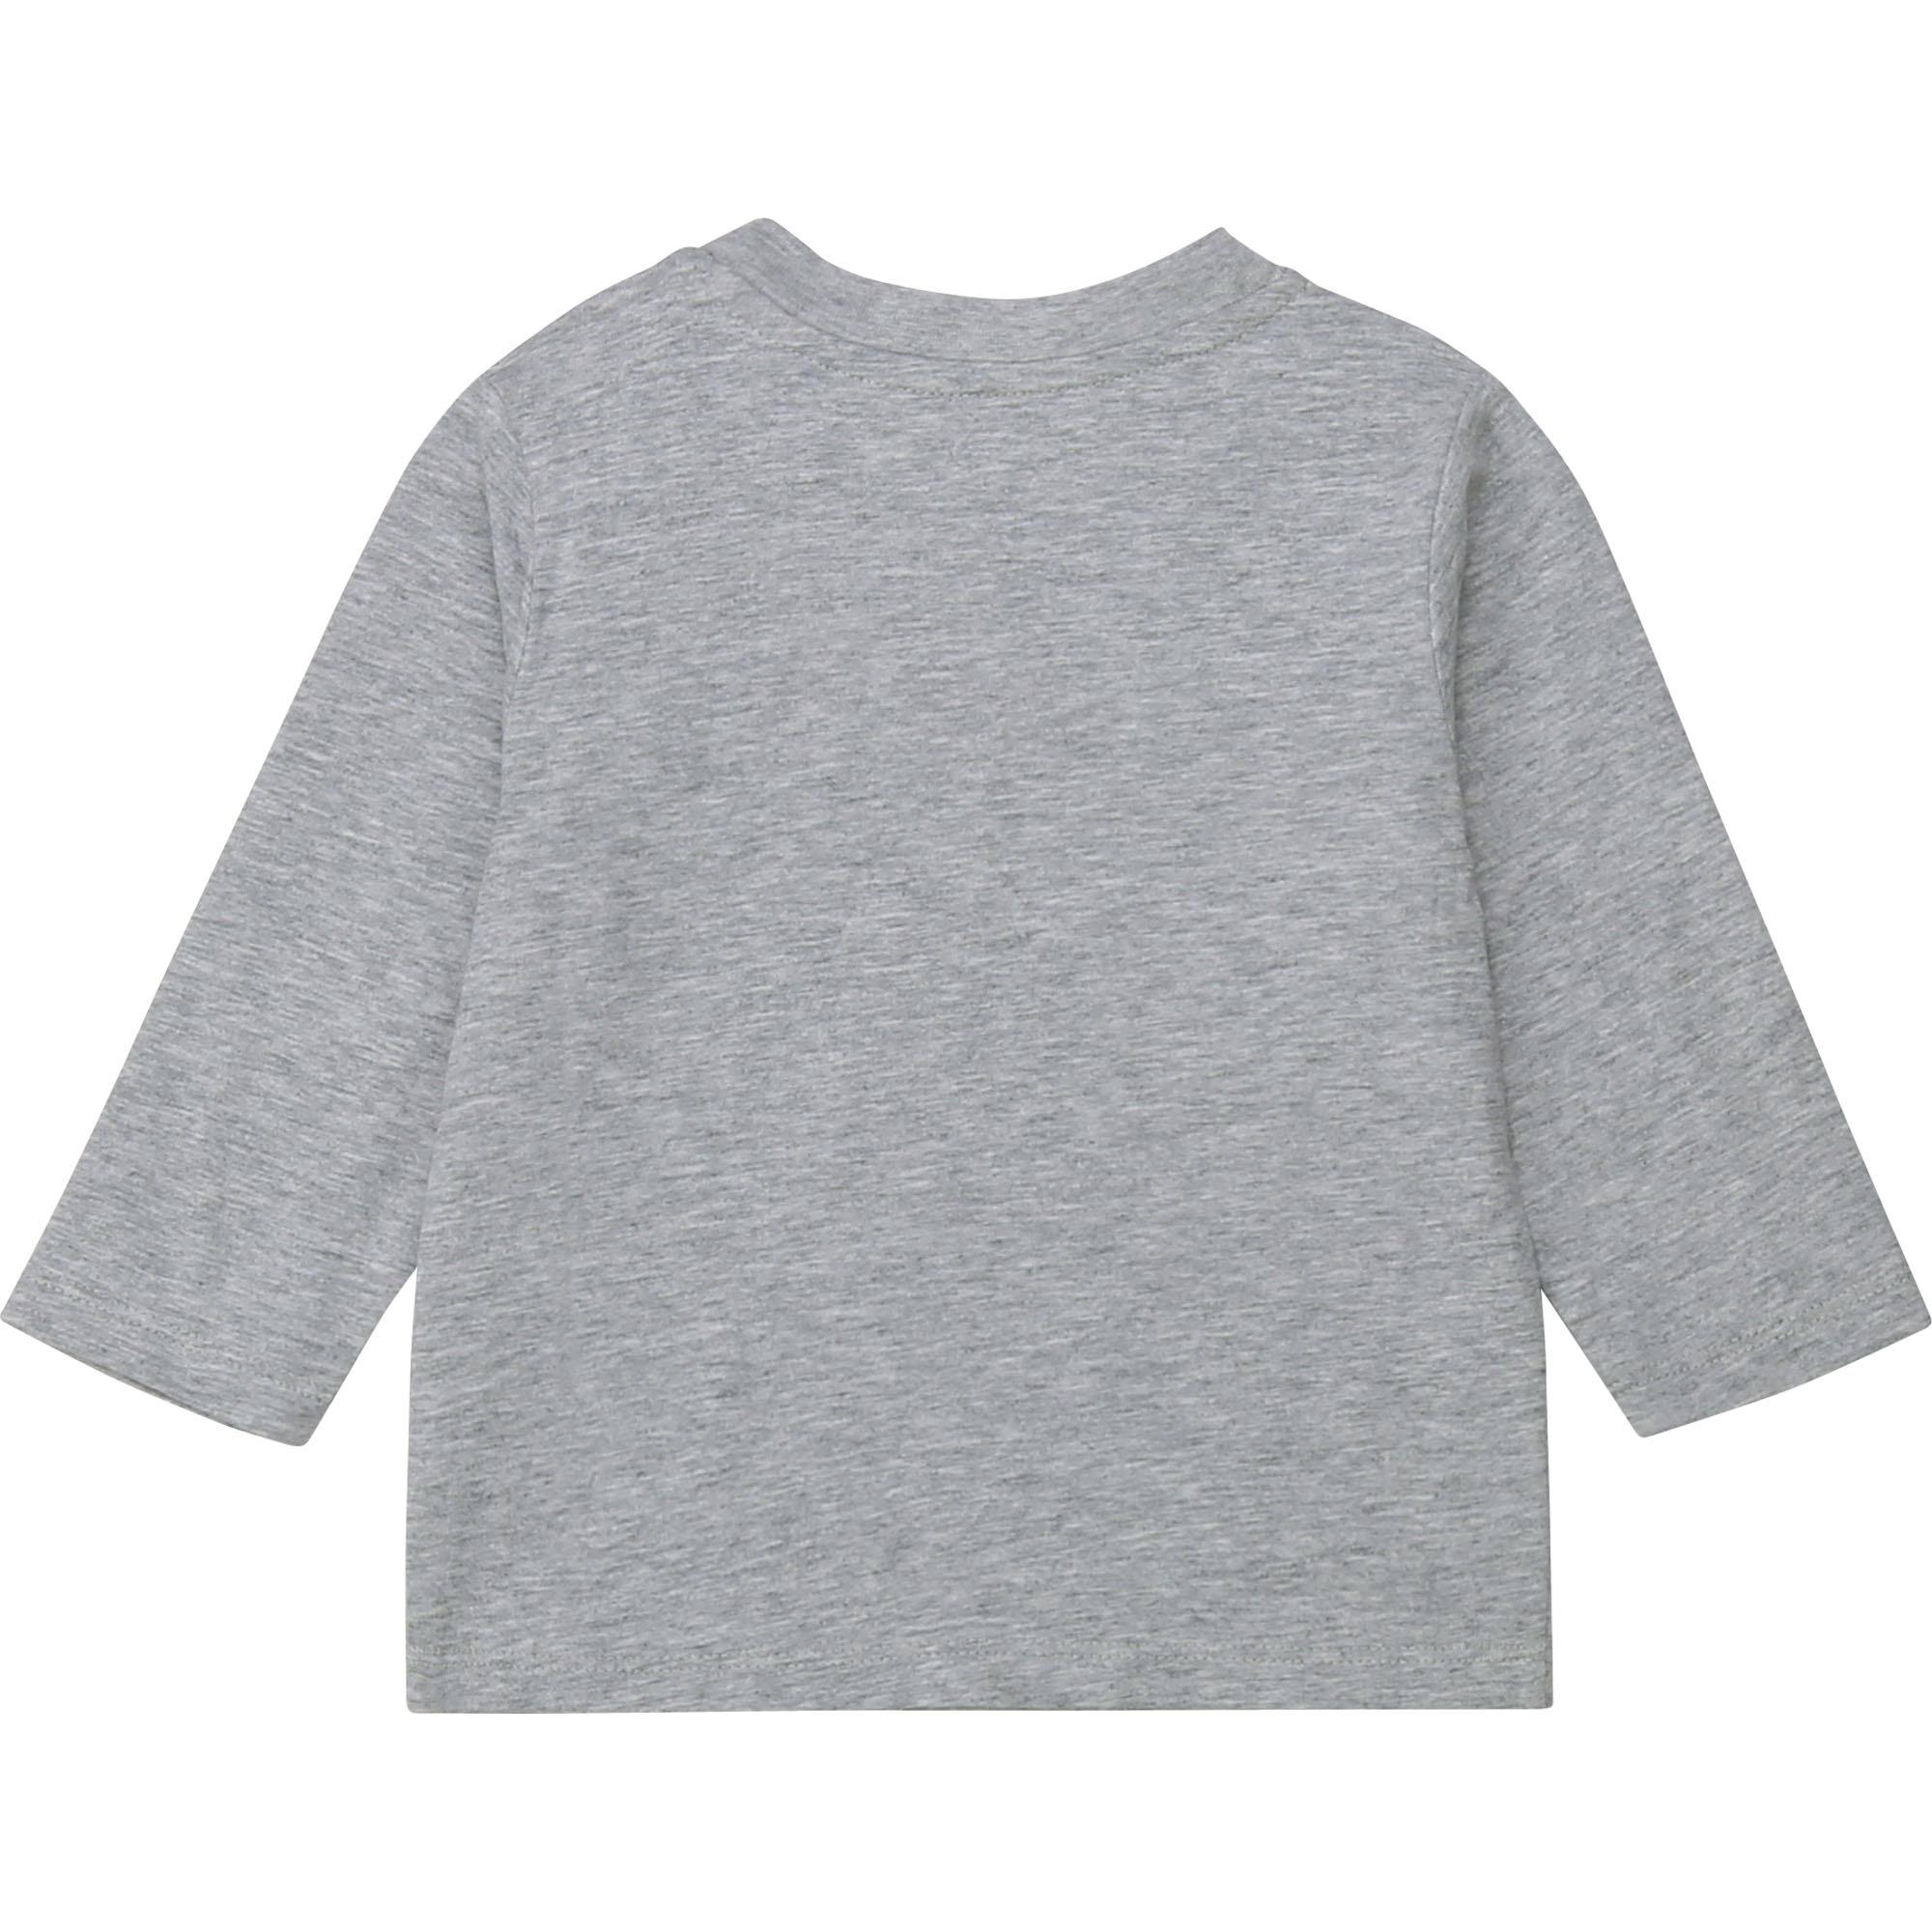 TIMBERLAND t-shirt jersey manches longues-4